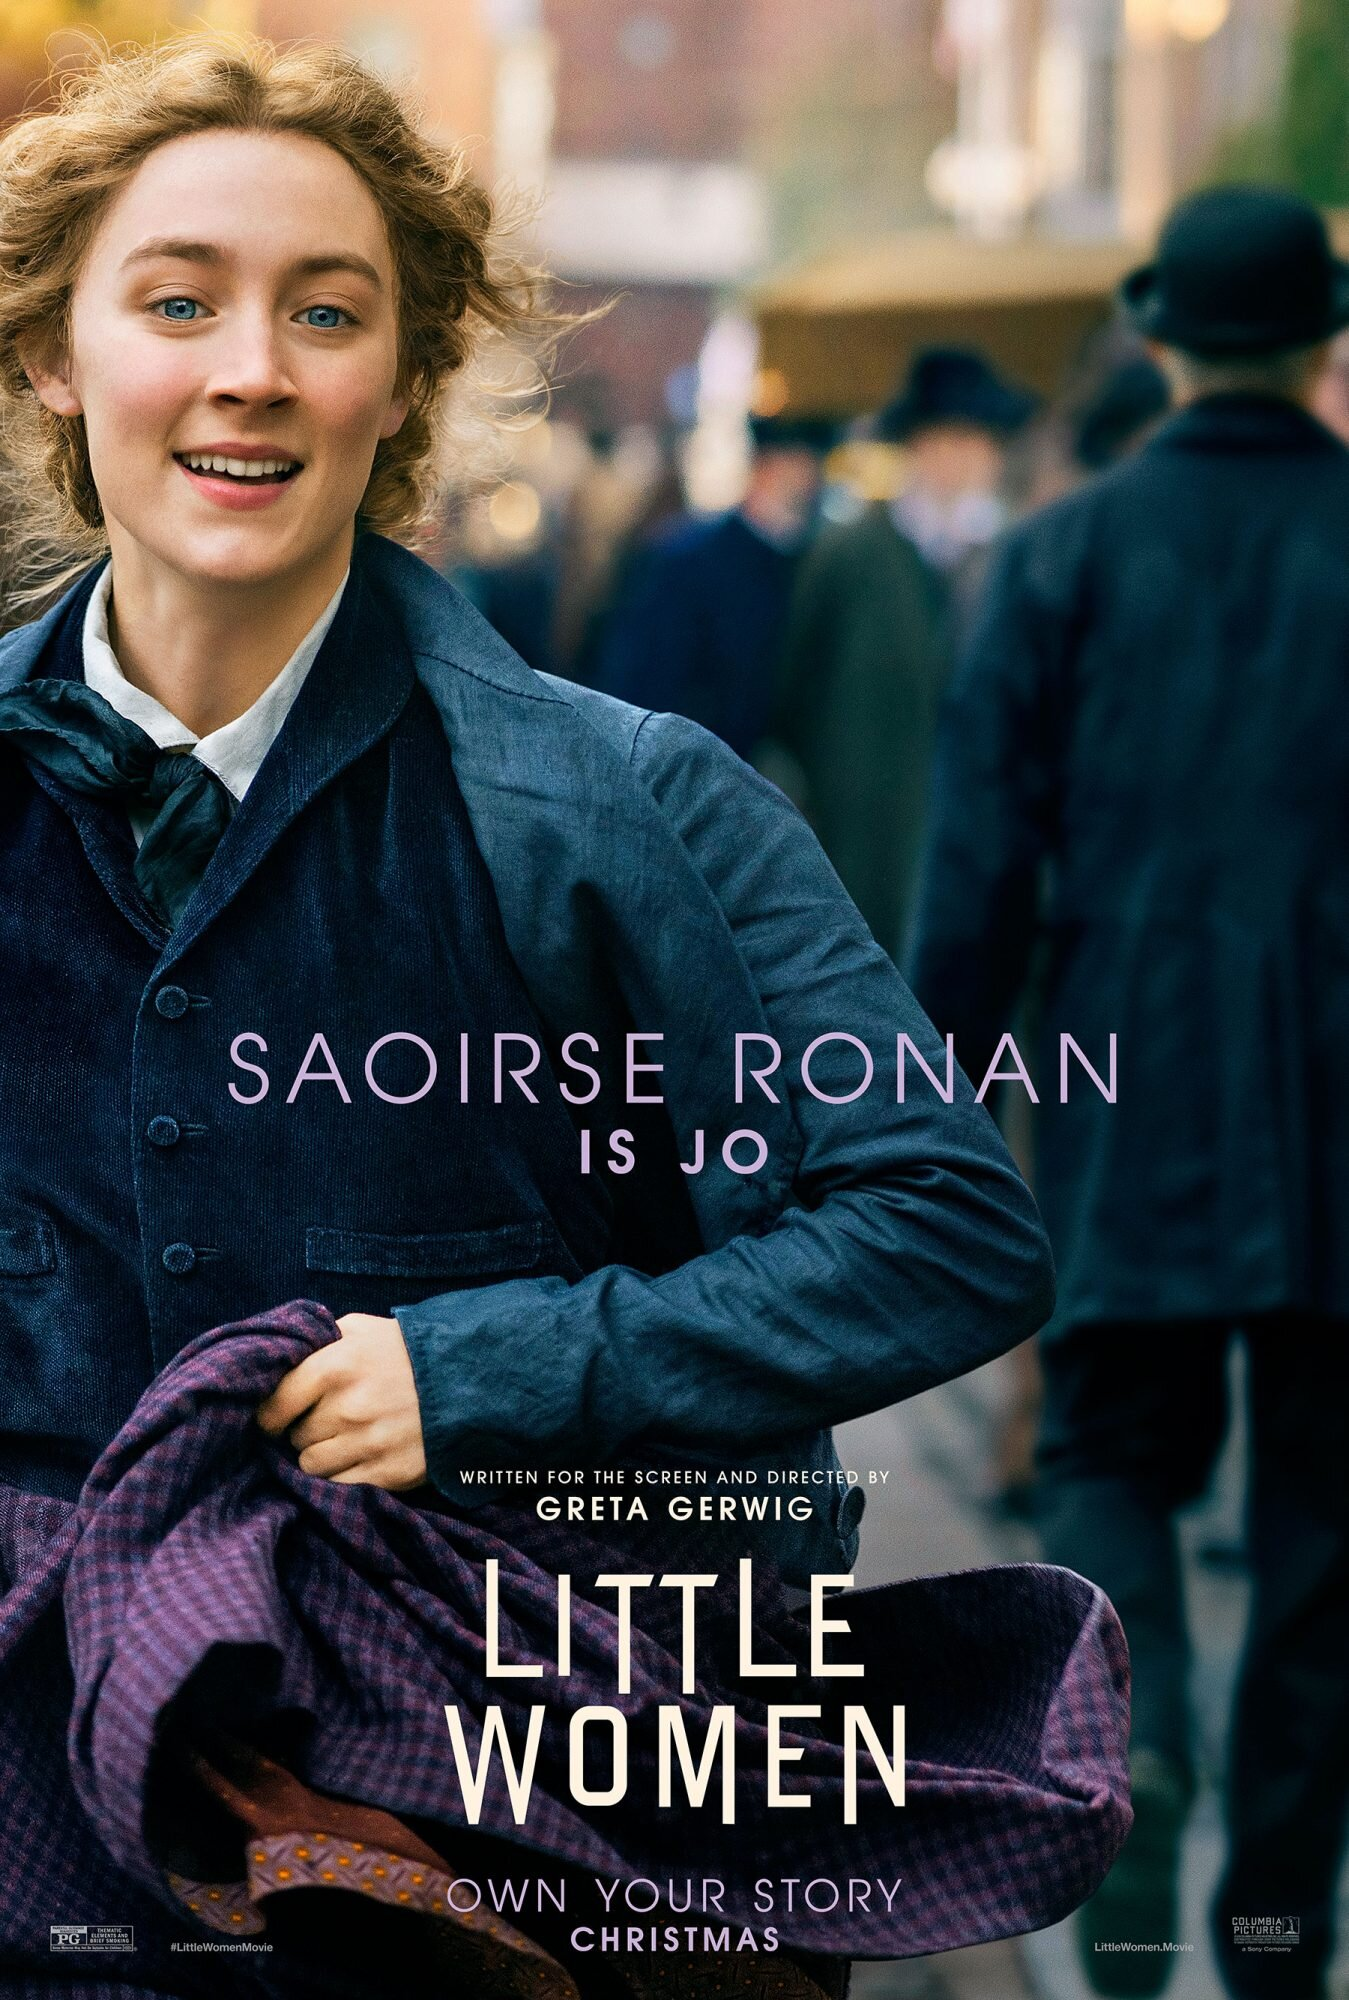 Little Women posters assemble Saoirse Ronan, Meryl Streep ...